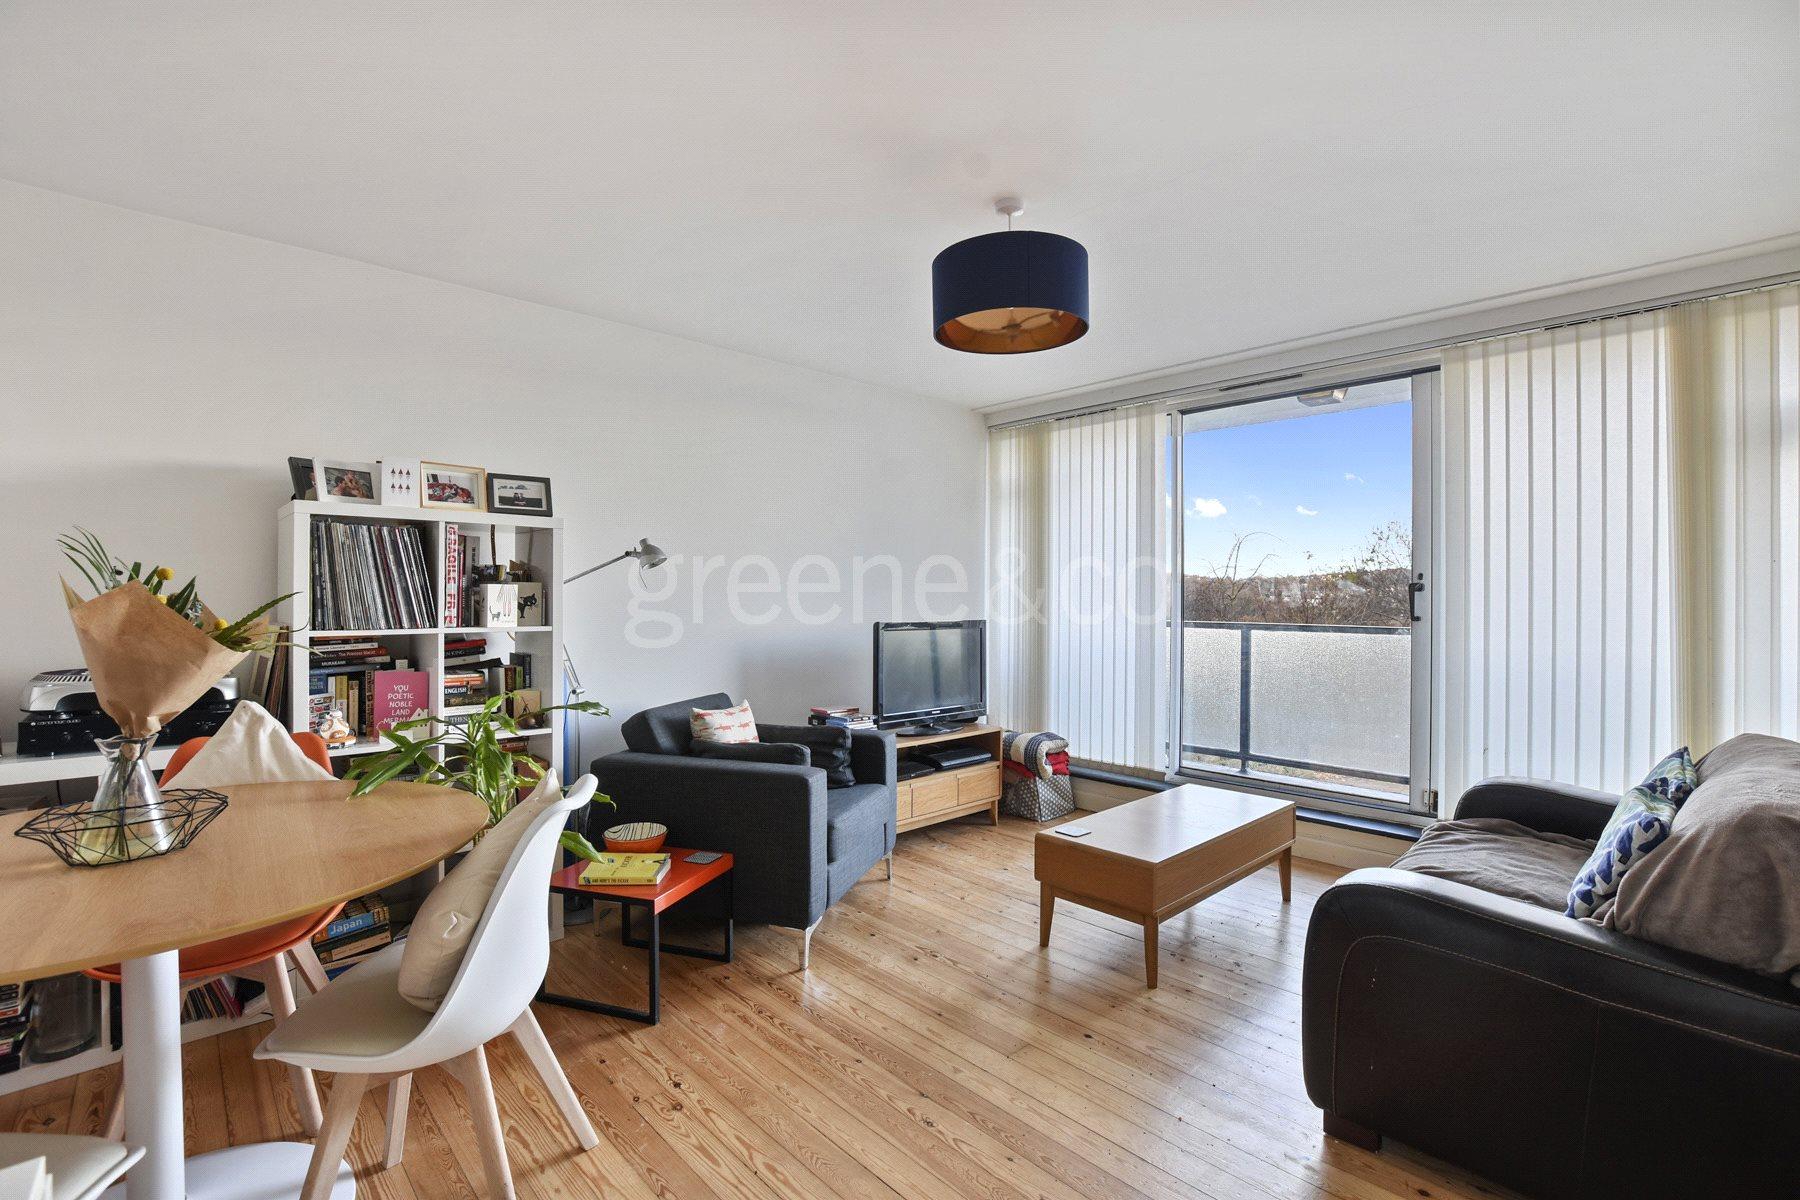 1 Bedroom Flat for sale in Shepherds Hill, Highgate, London, N6